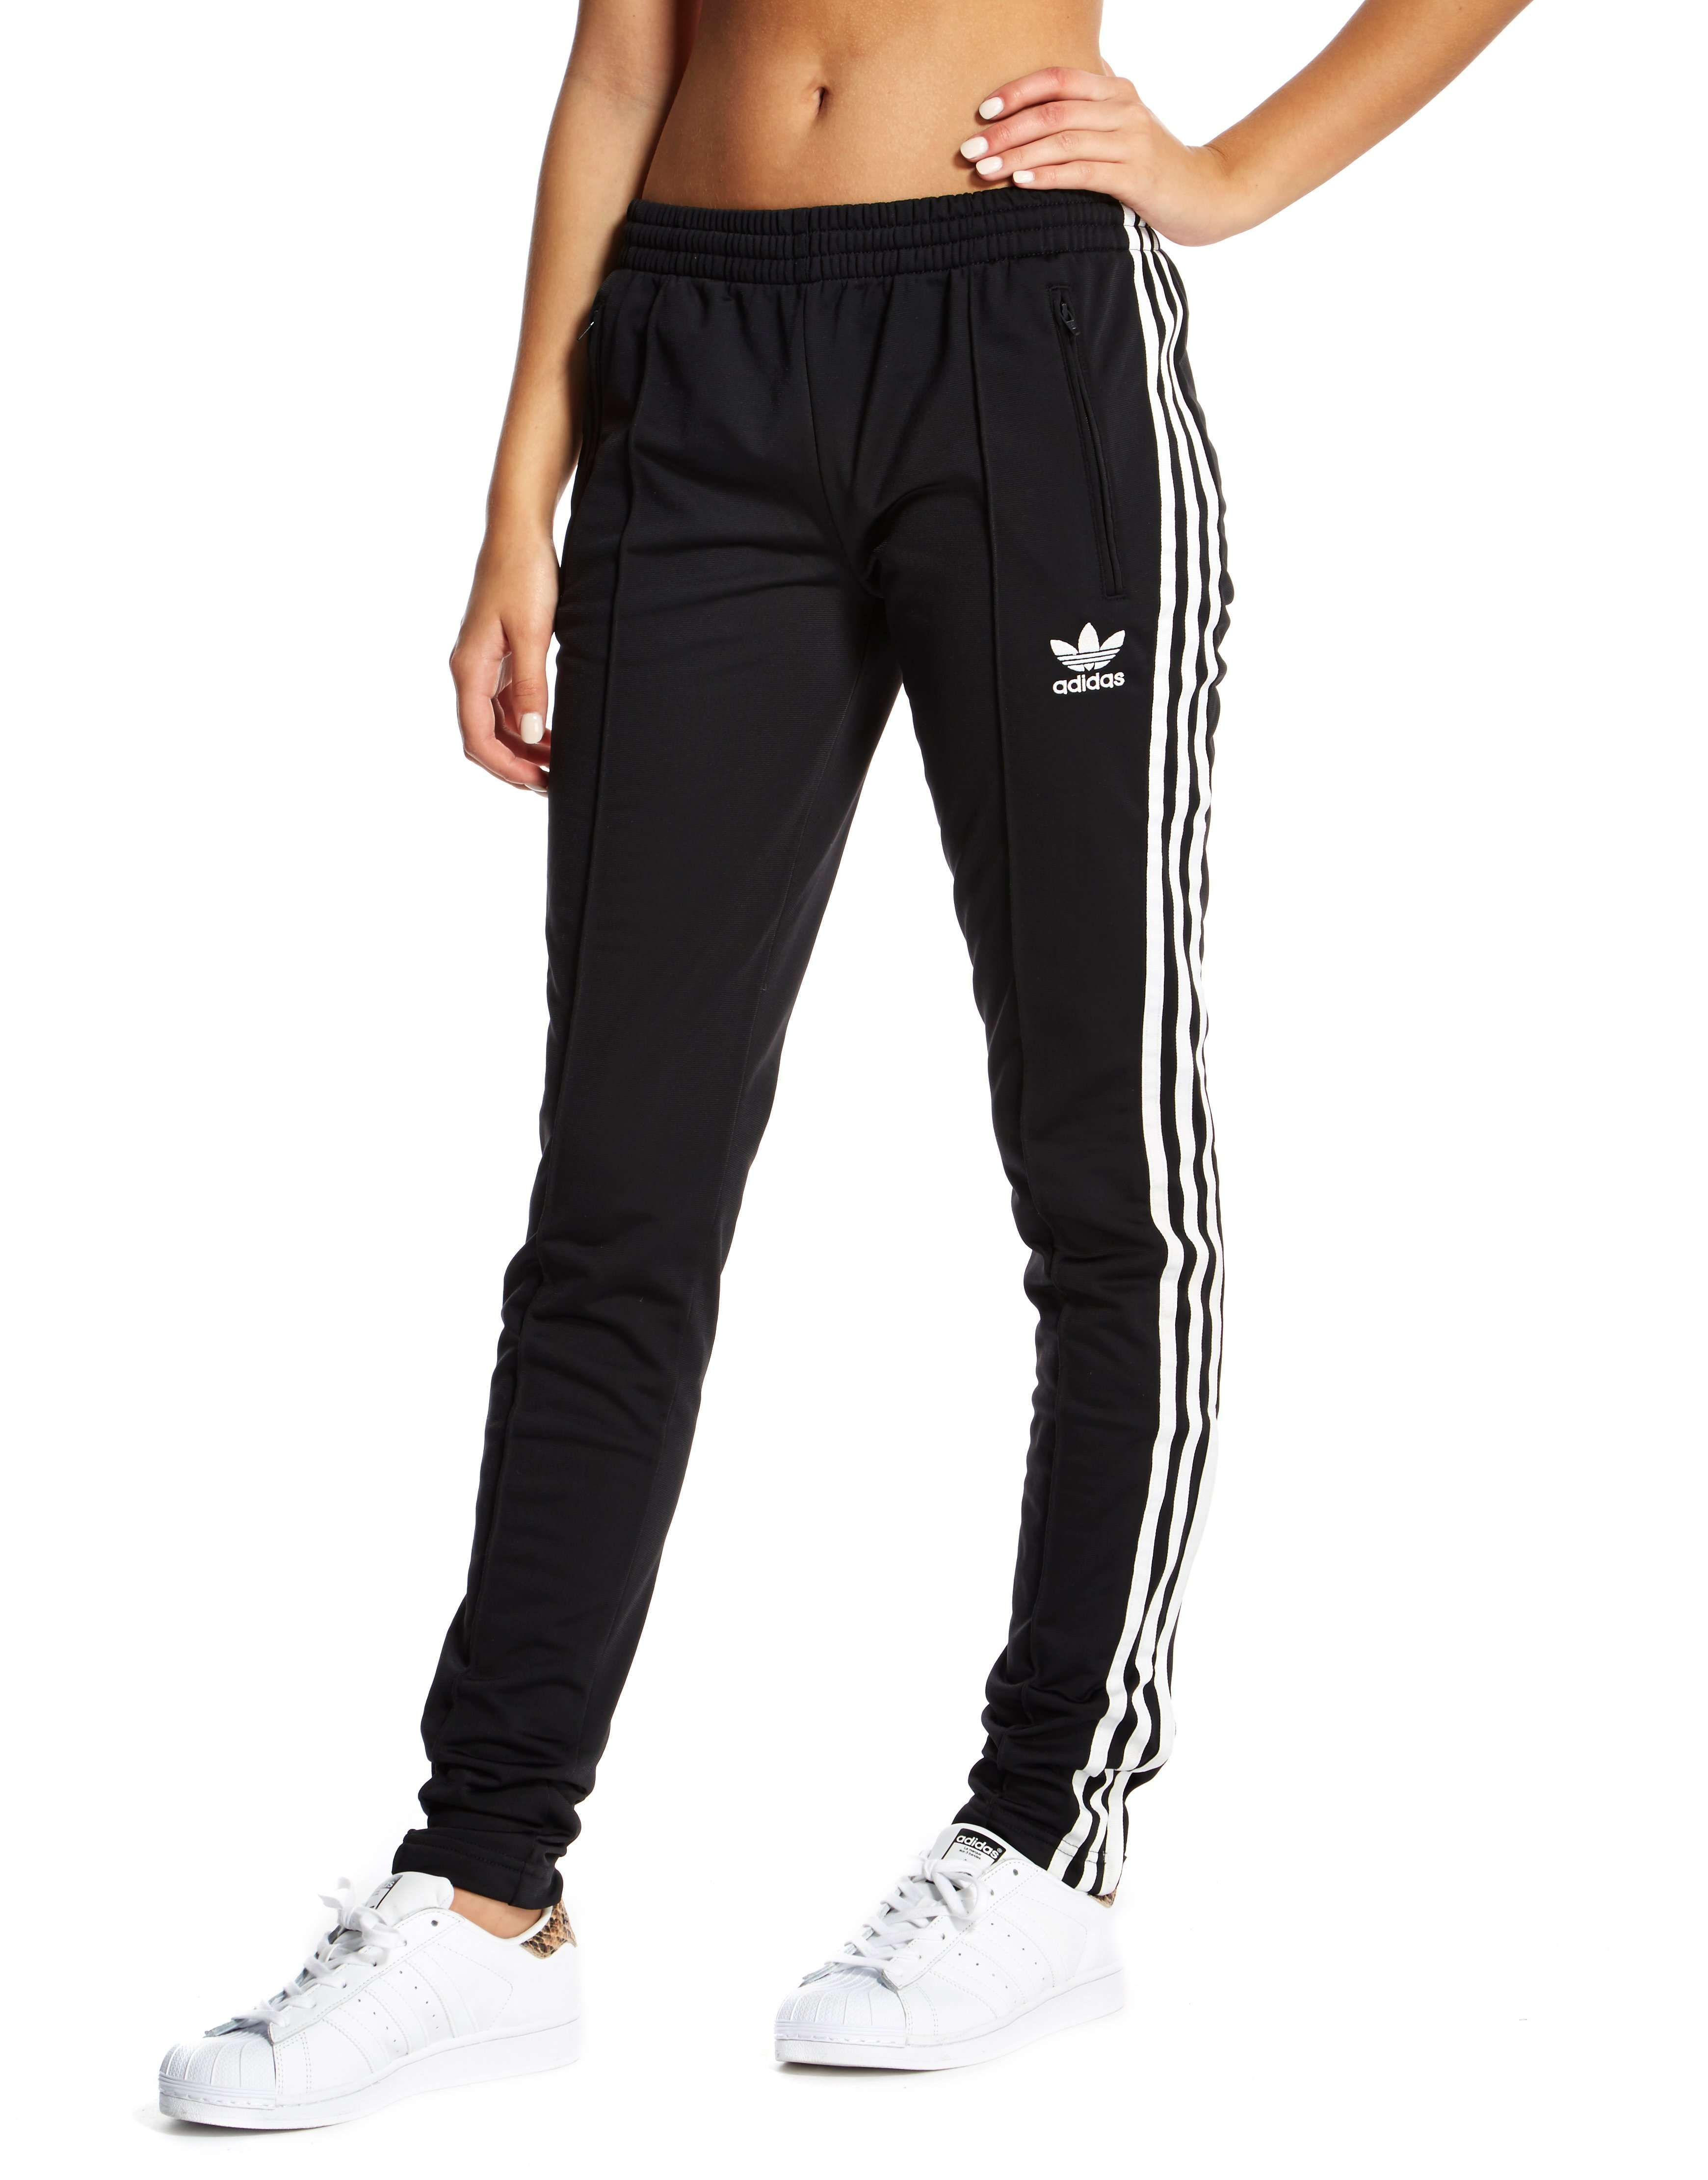 f218d8c12f8b adidas Originals Supergirl Track Pants - Shop online for adidas Originals  Supergirl Track Pants with JD Sports